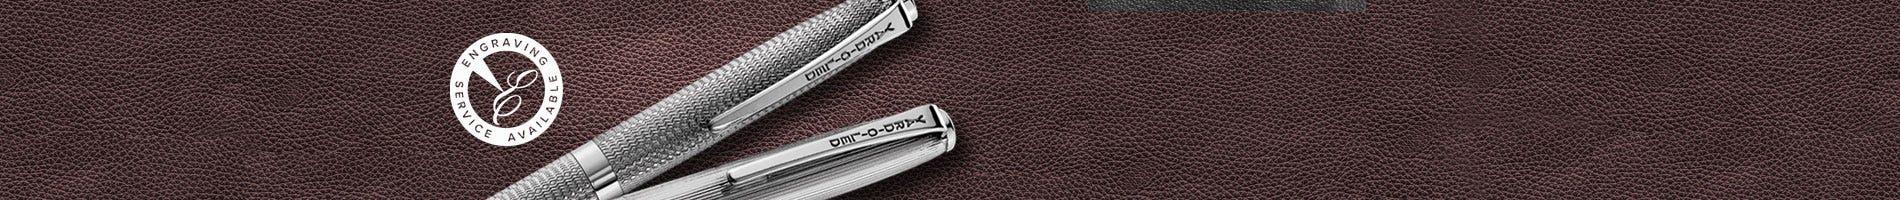 yard-o-led perfecta victorian fountain pen